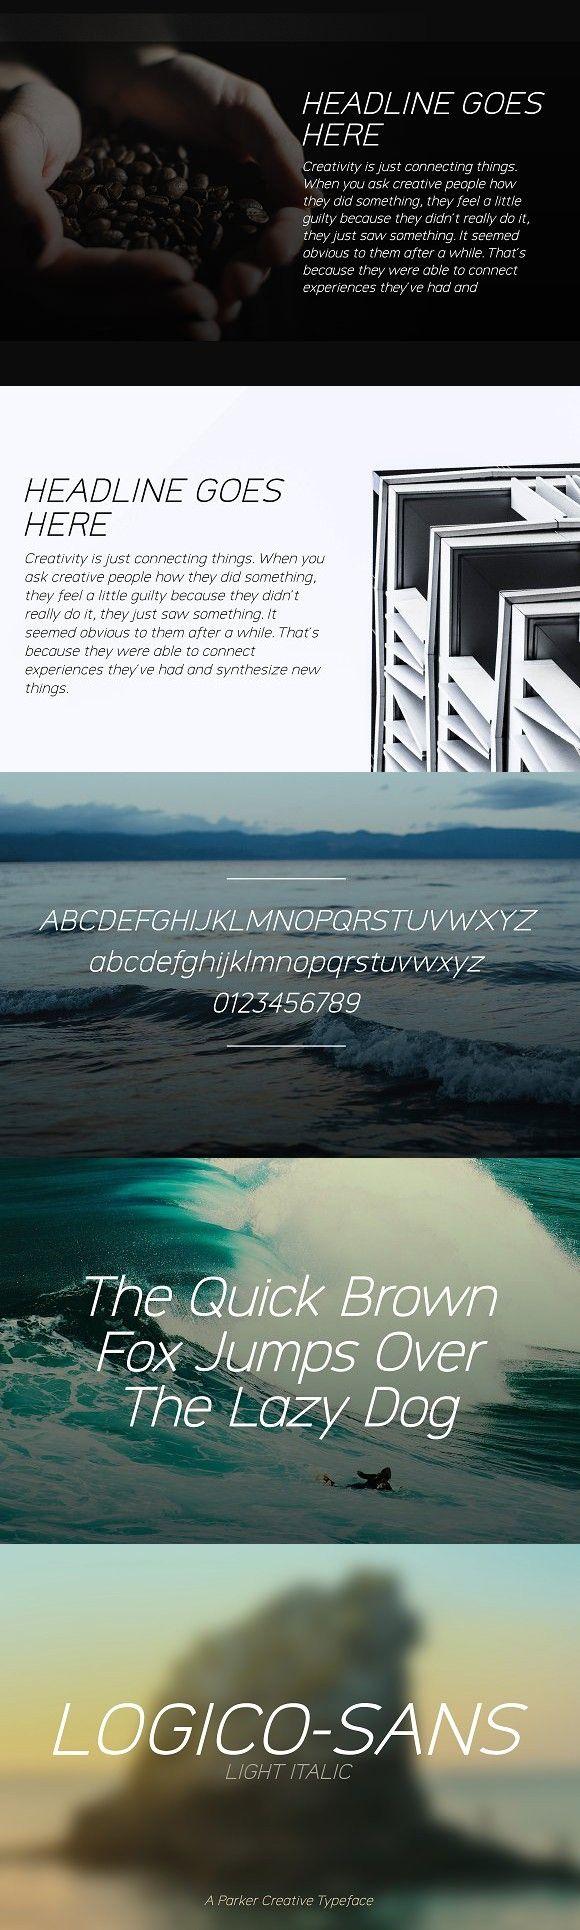 Logico-Sans Font - Light Italic. Professional Fonts